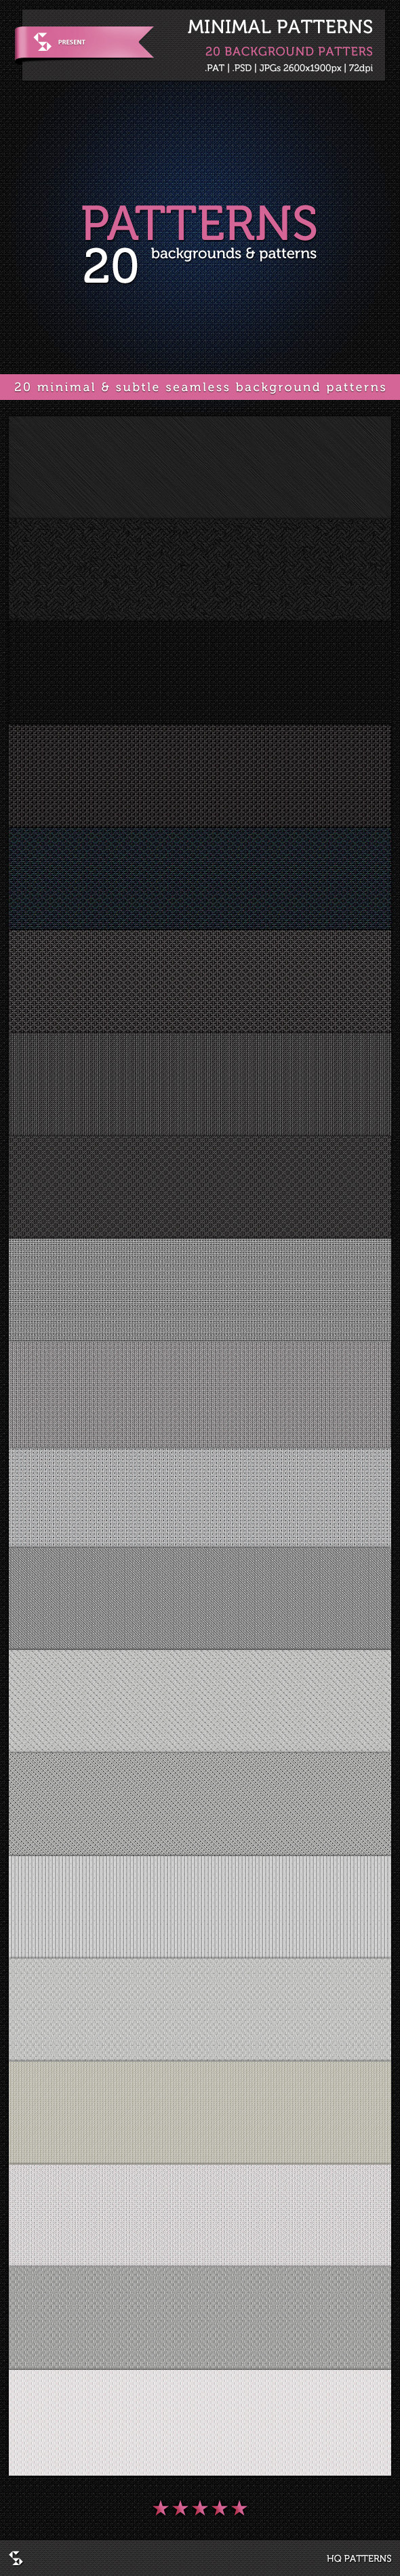 20 Minimal Patterns - Subtle Background Patterns - Textures / Fills / Patterns Photoshop